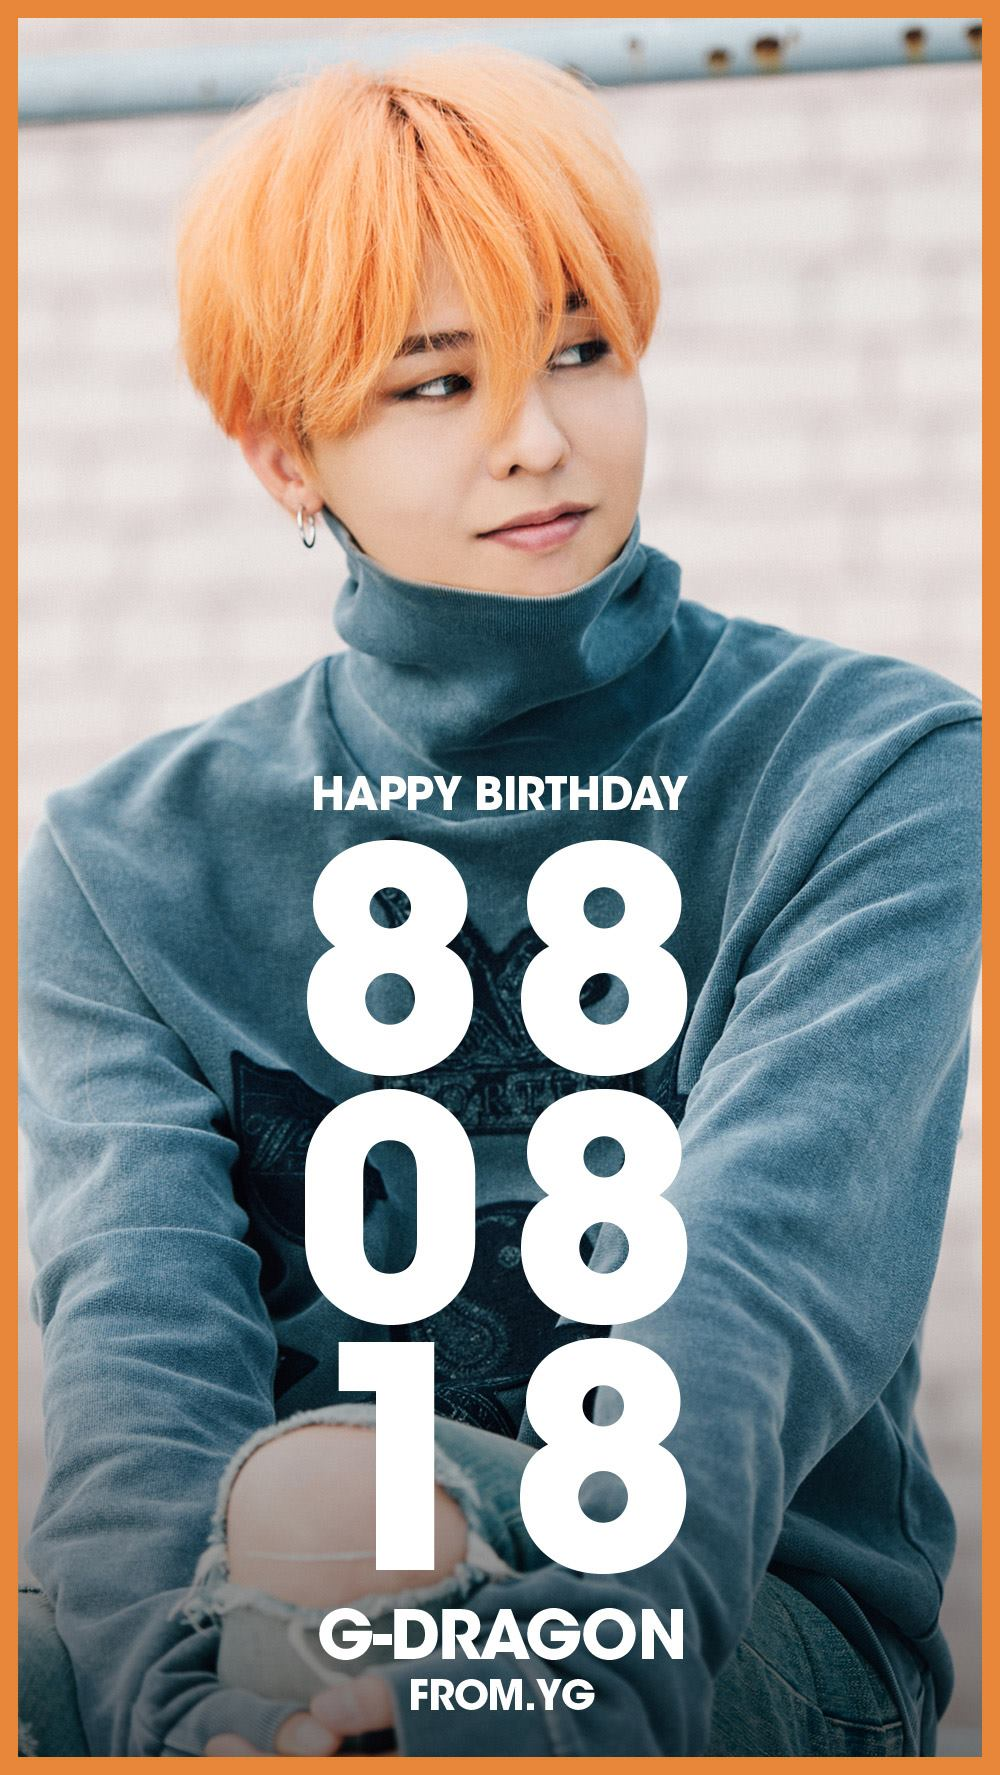 G Dragon Bigbang Fashion Nail Art Sticker Kpop Star Gift: YG Entertainment And Fans Celebrate BIGBANG Leader G